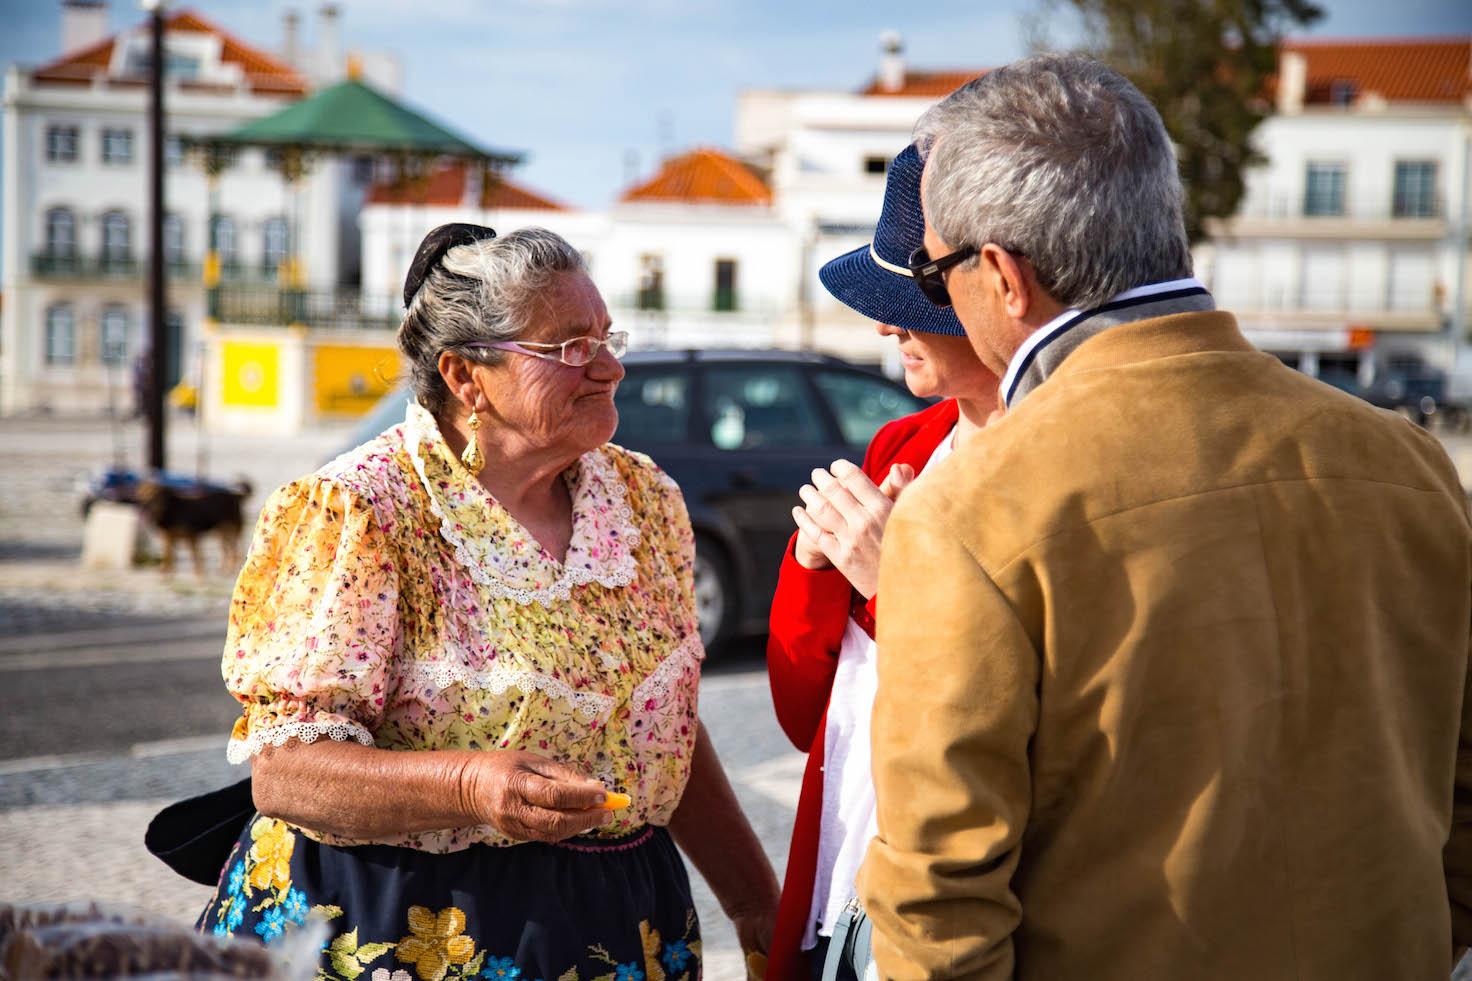 nazare-seven-skirts-portugal-moments-of-yugen-travel-blog_06